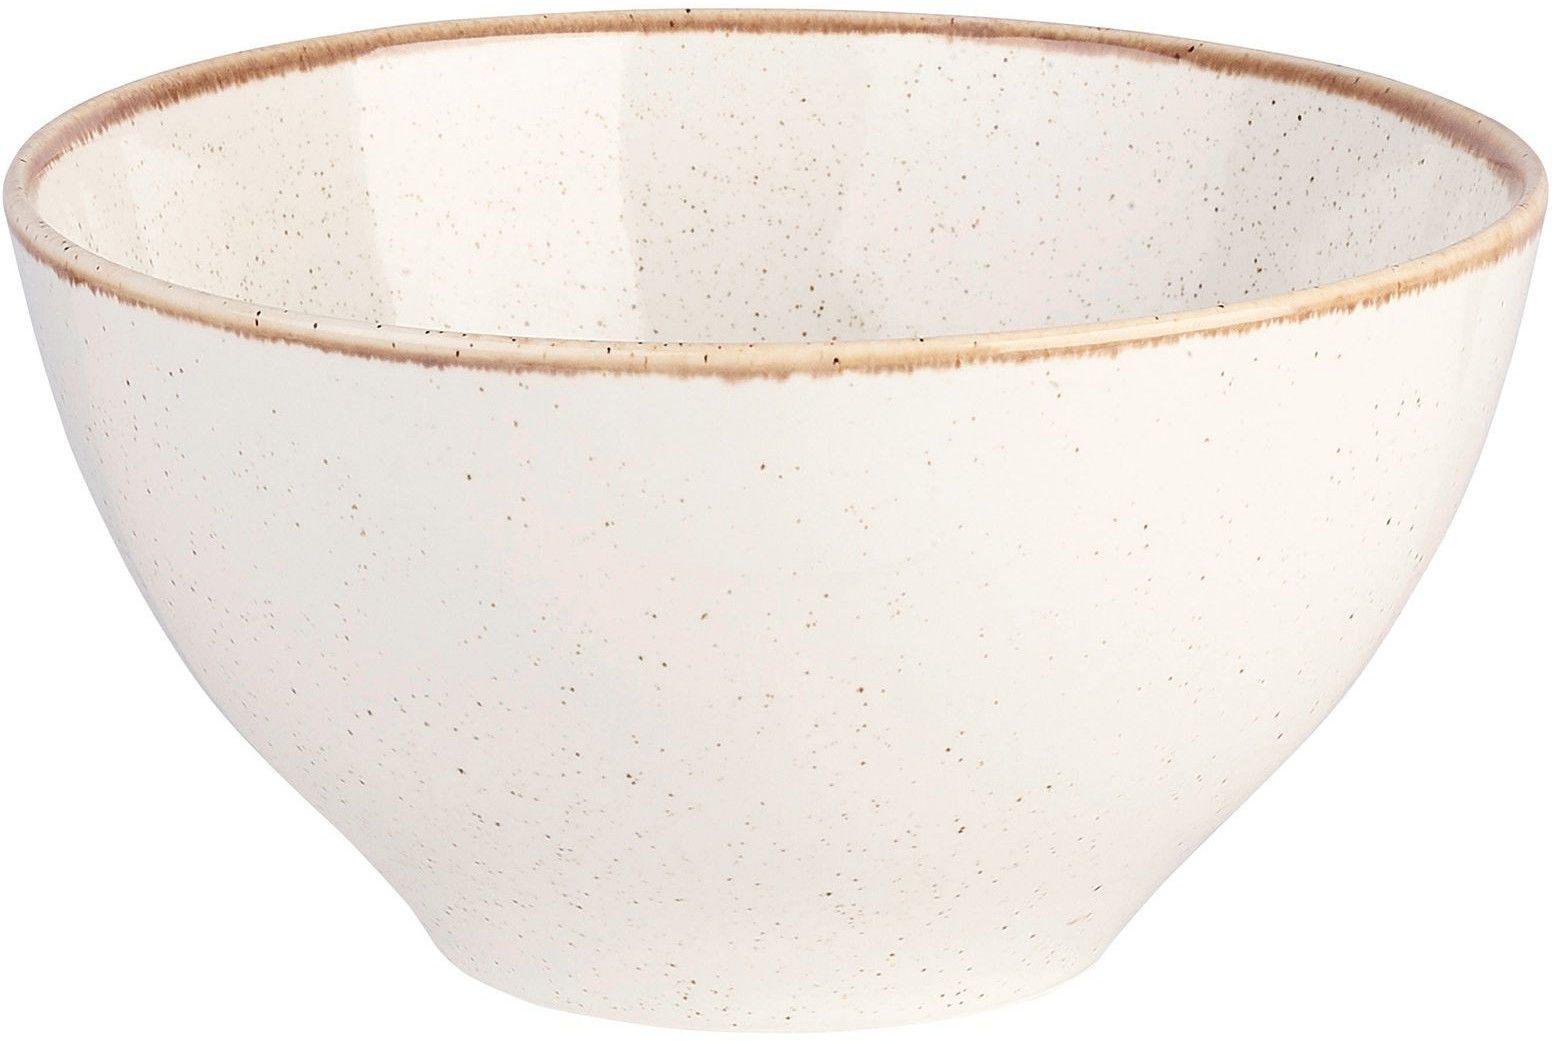 Miska 770 ml Sand porcelana Fine Dine 04ALM002429